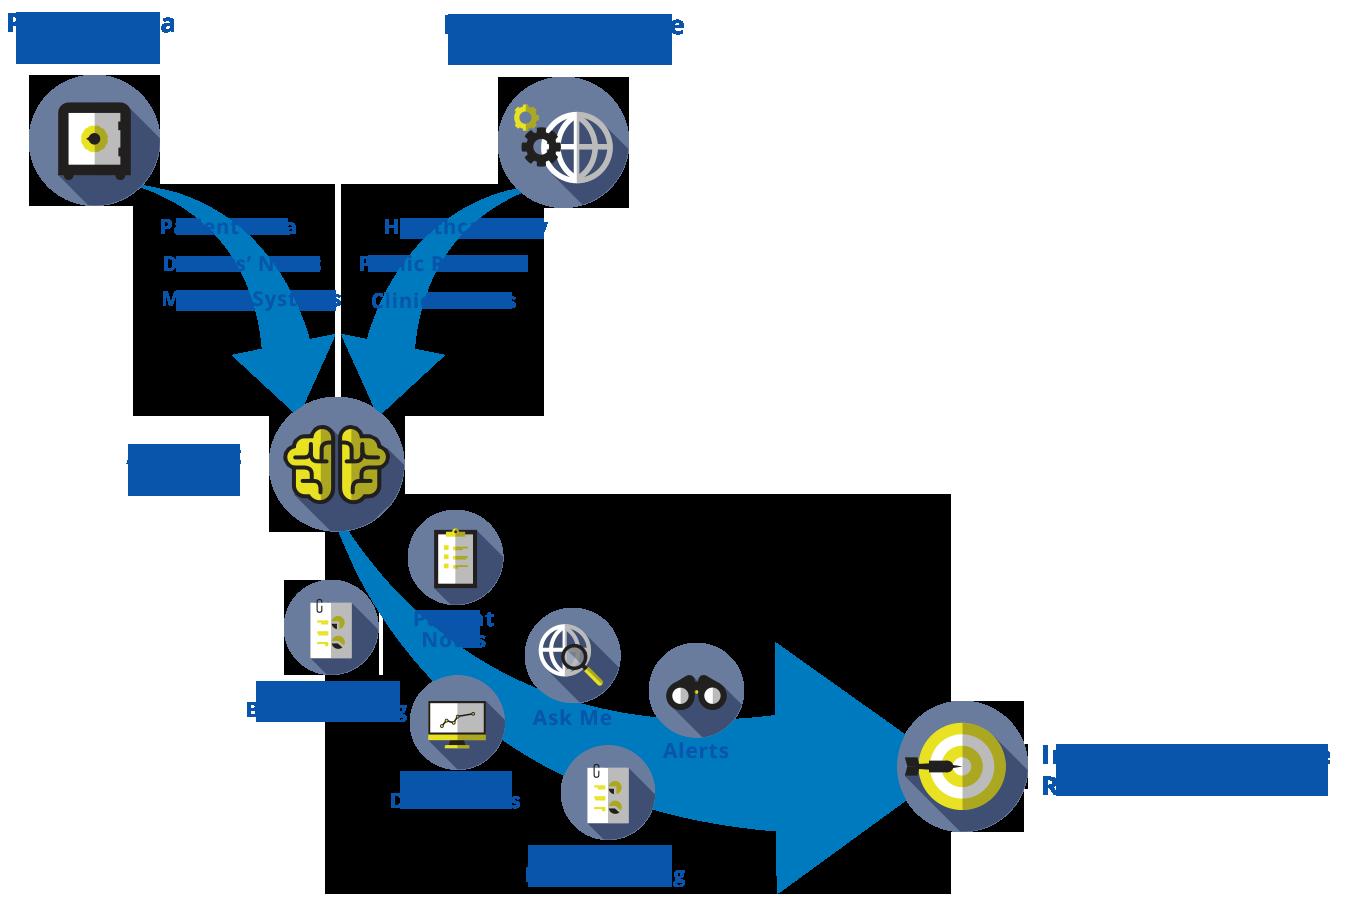 Pluaris for healthcare workflow diagram